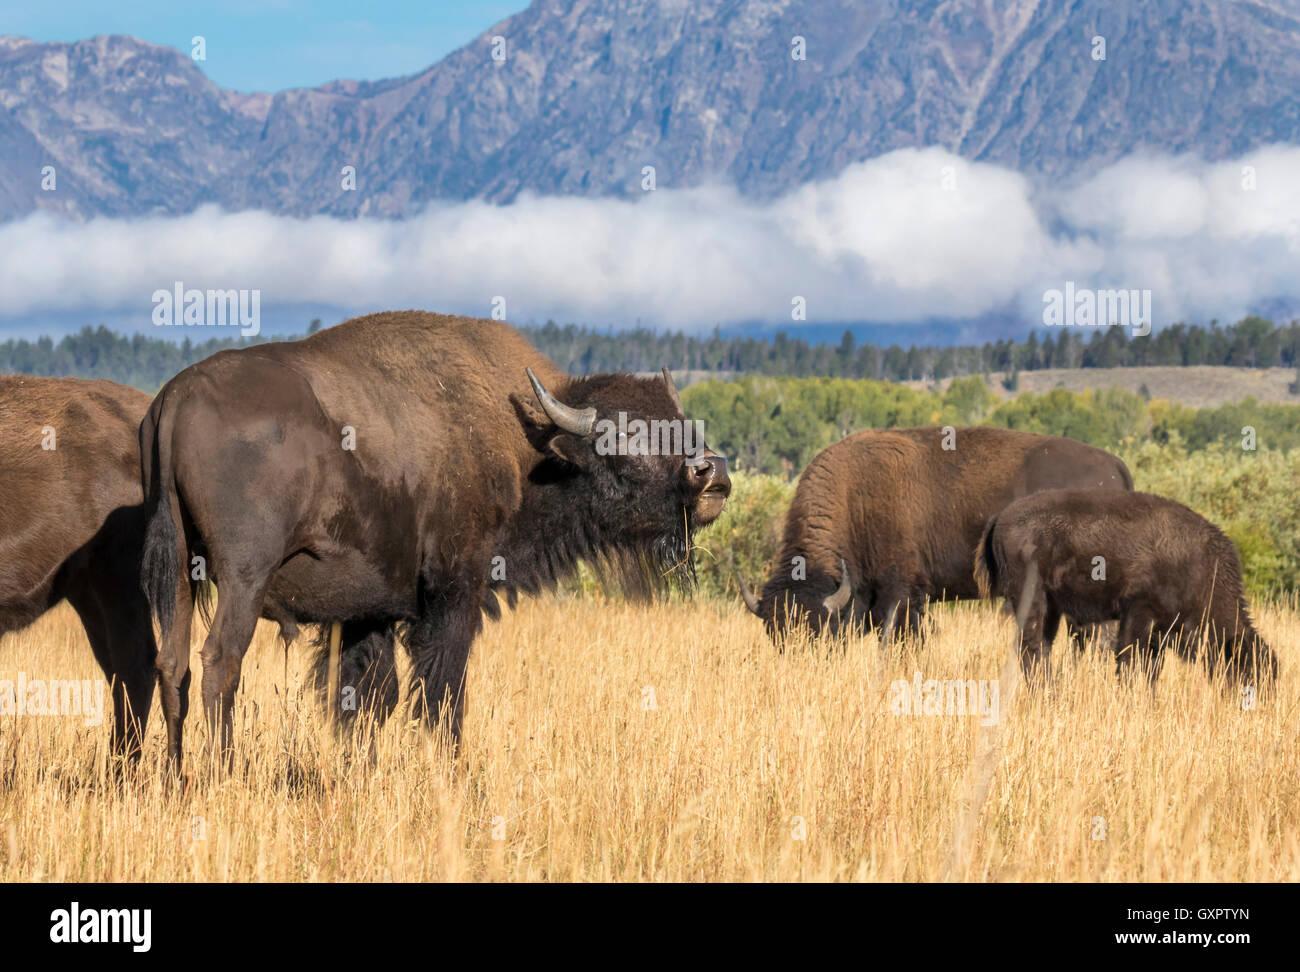 American bison (Bison bison) grazing in highland prairie, Grand Teton National Park, Wyoming, USA - Stock Image